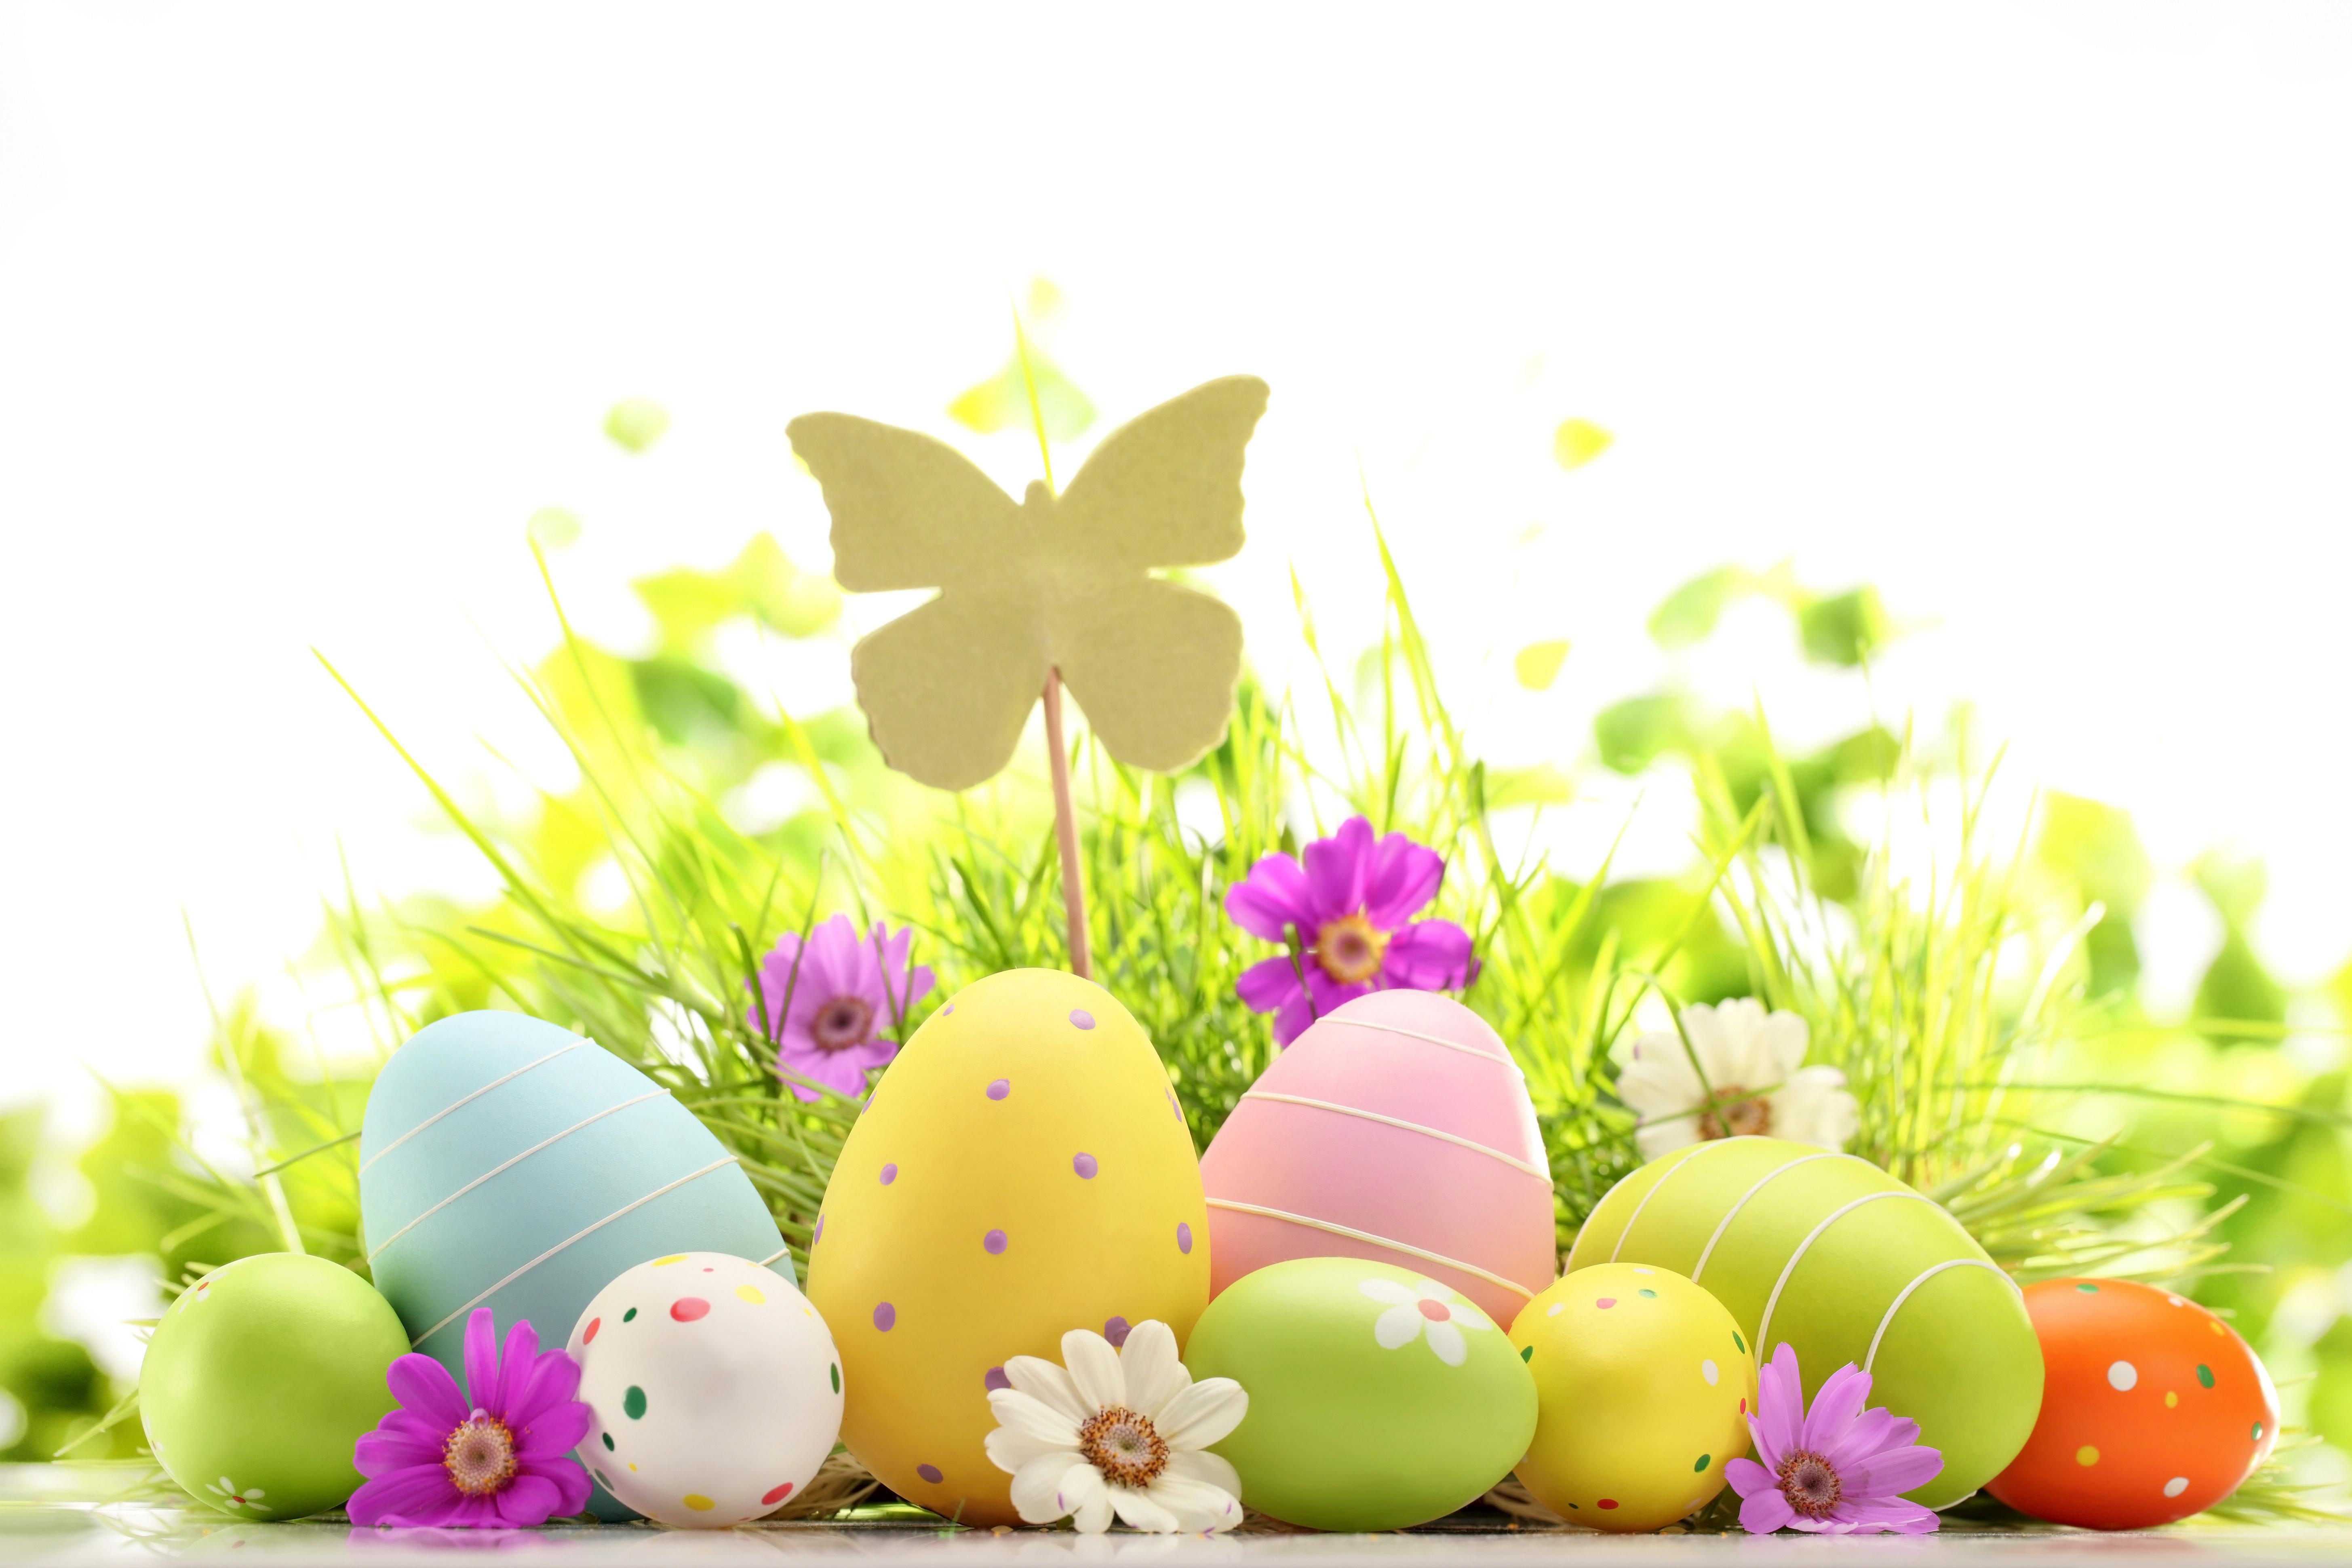 Pack12 Easter Wallpapers 5820x3880 px WallpapersExpertcom 5820x3880